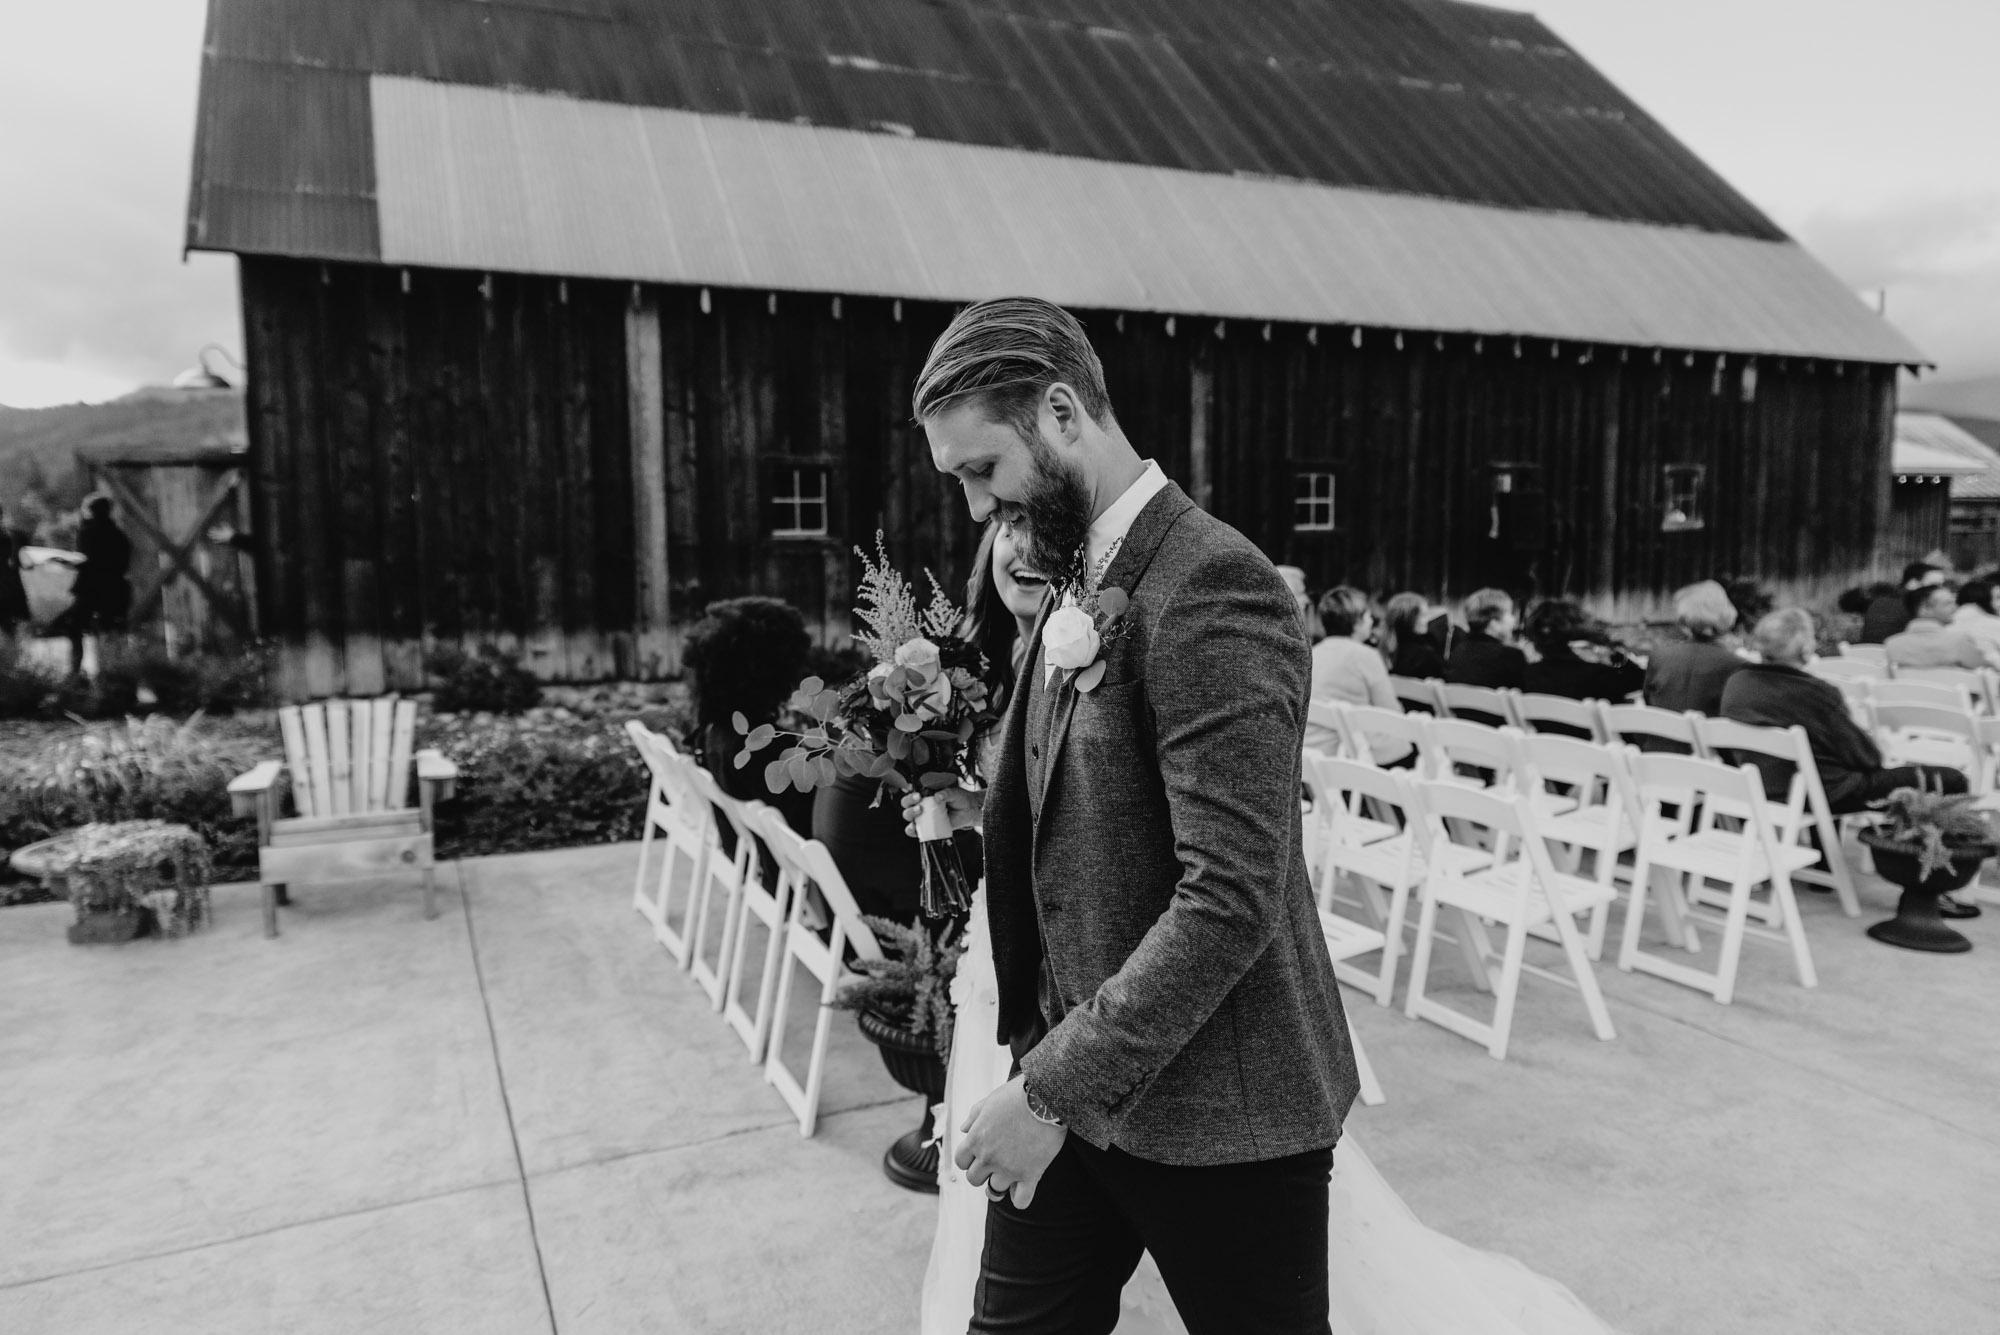 Outdoor-Summer-Ceremony-Washington-Wedding-Rainbow-5456.jpg